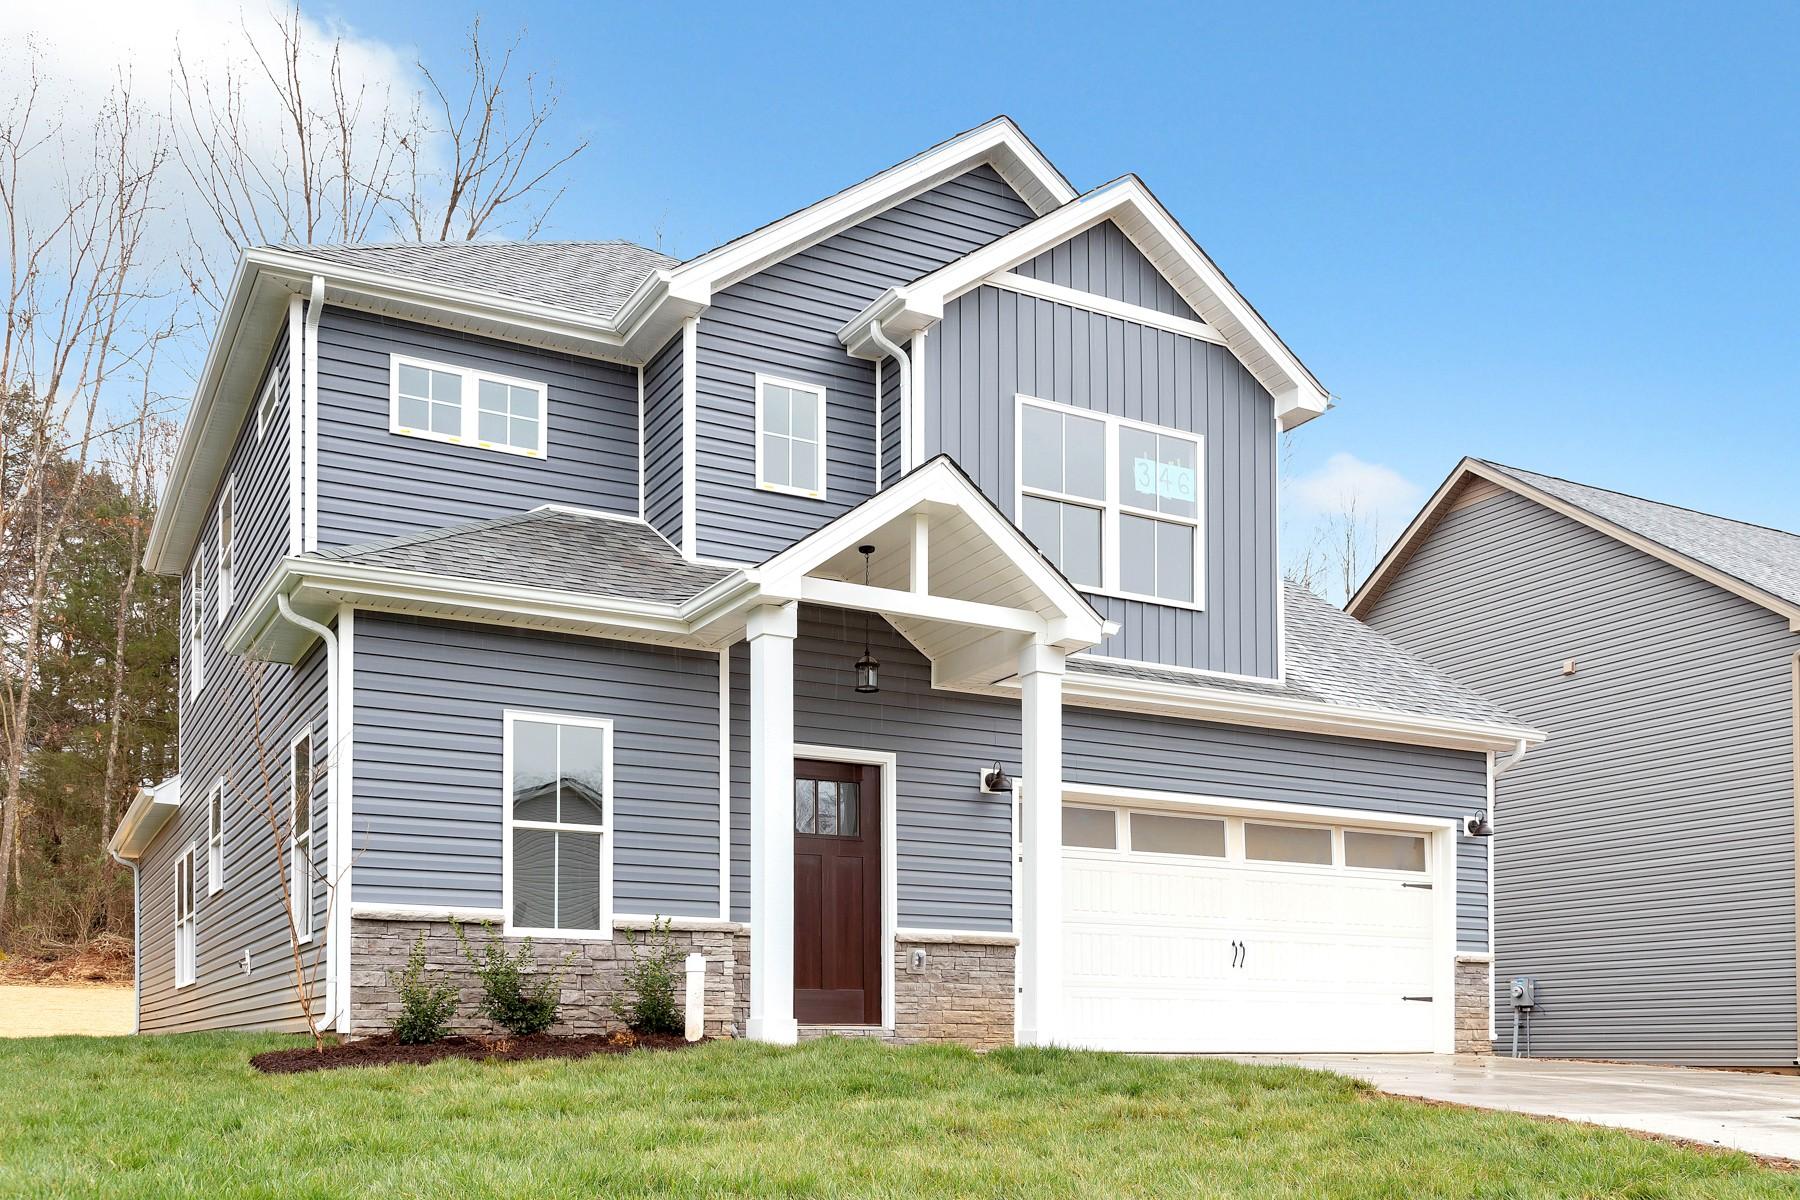 1668 Rains Rd, Clarksville, TN 37042 - Clarksville, TN real estate listing